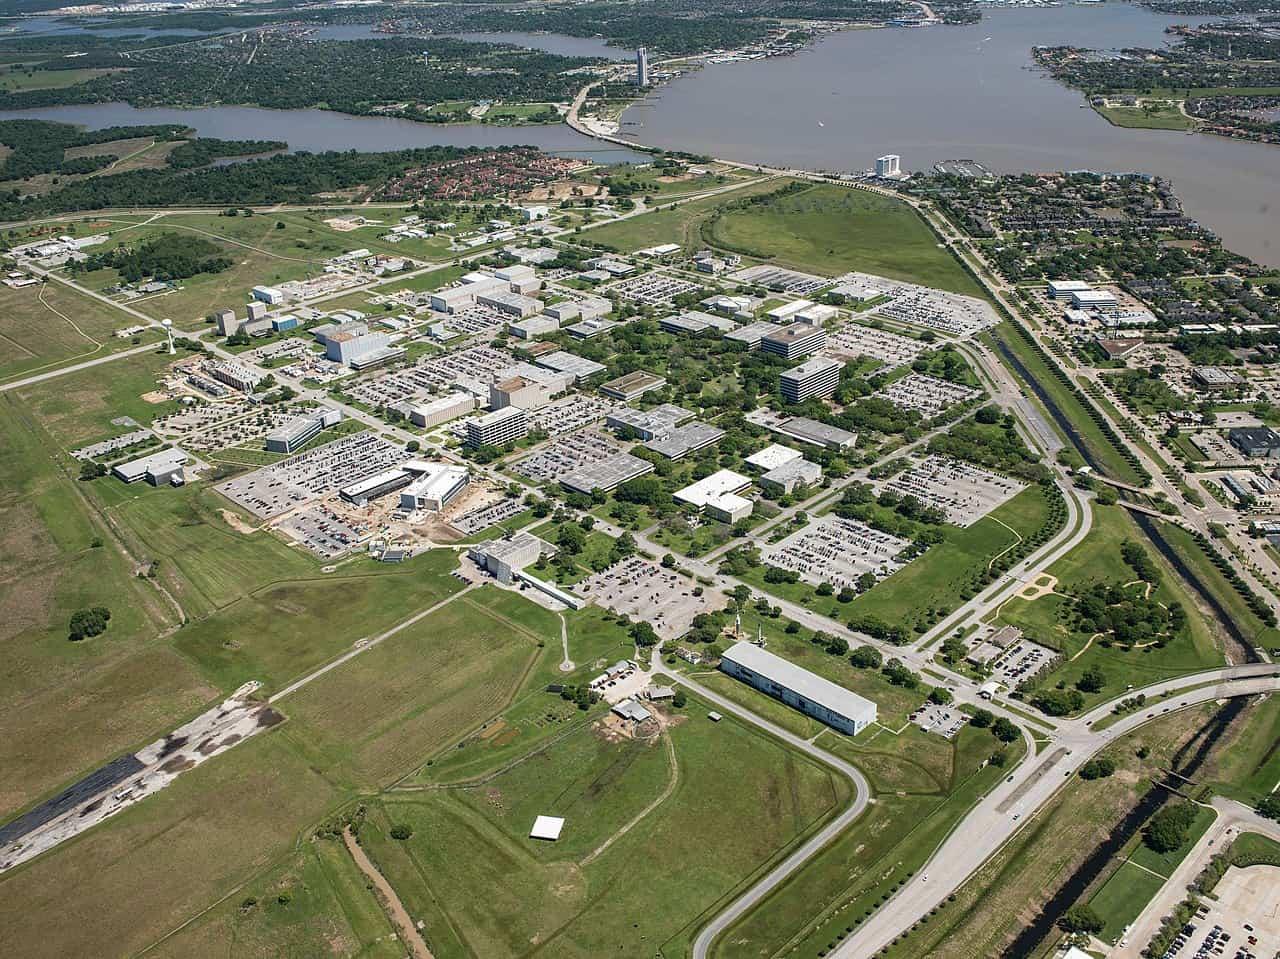 aerial photograph of the NASA space center